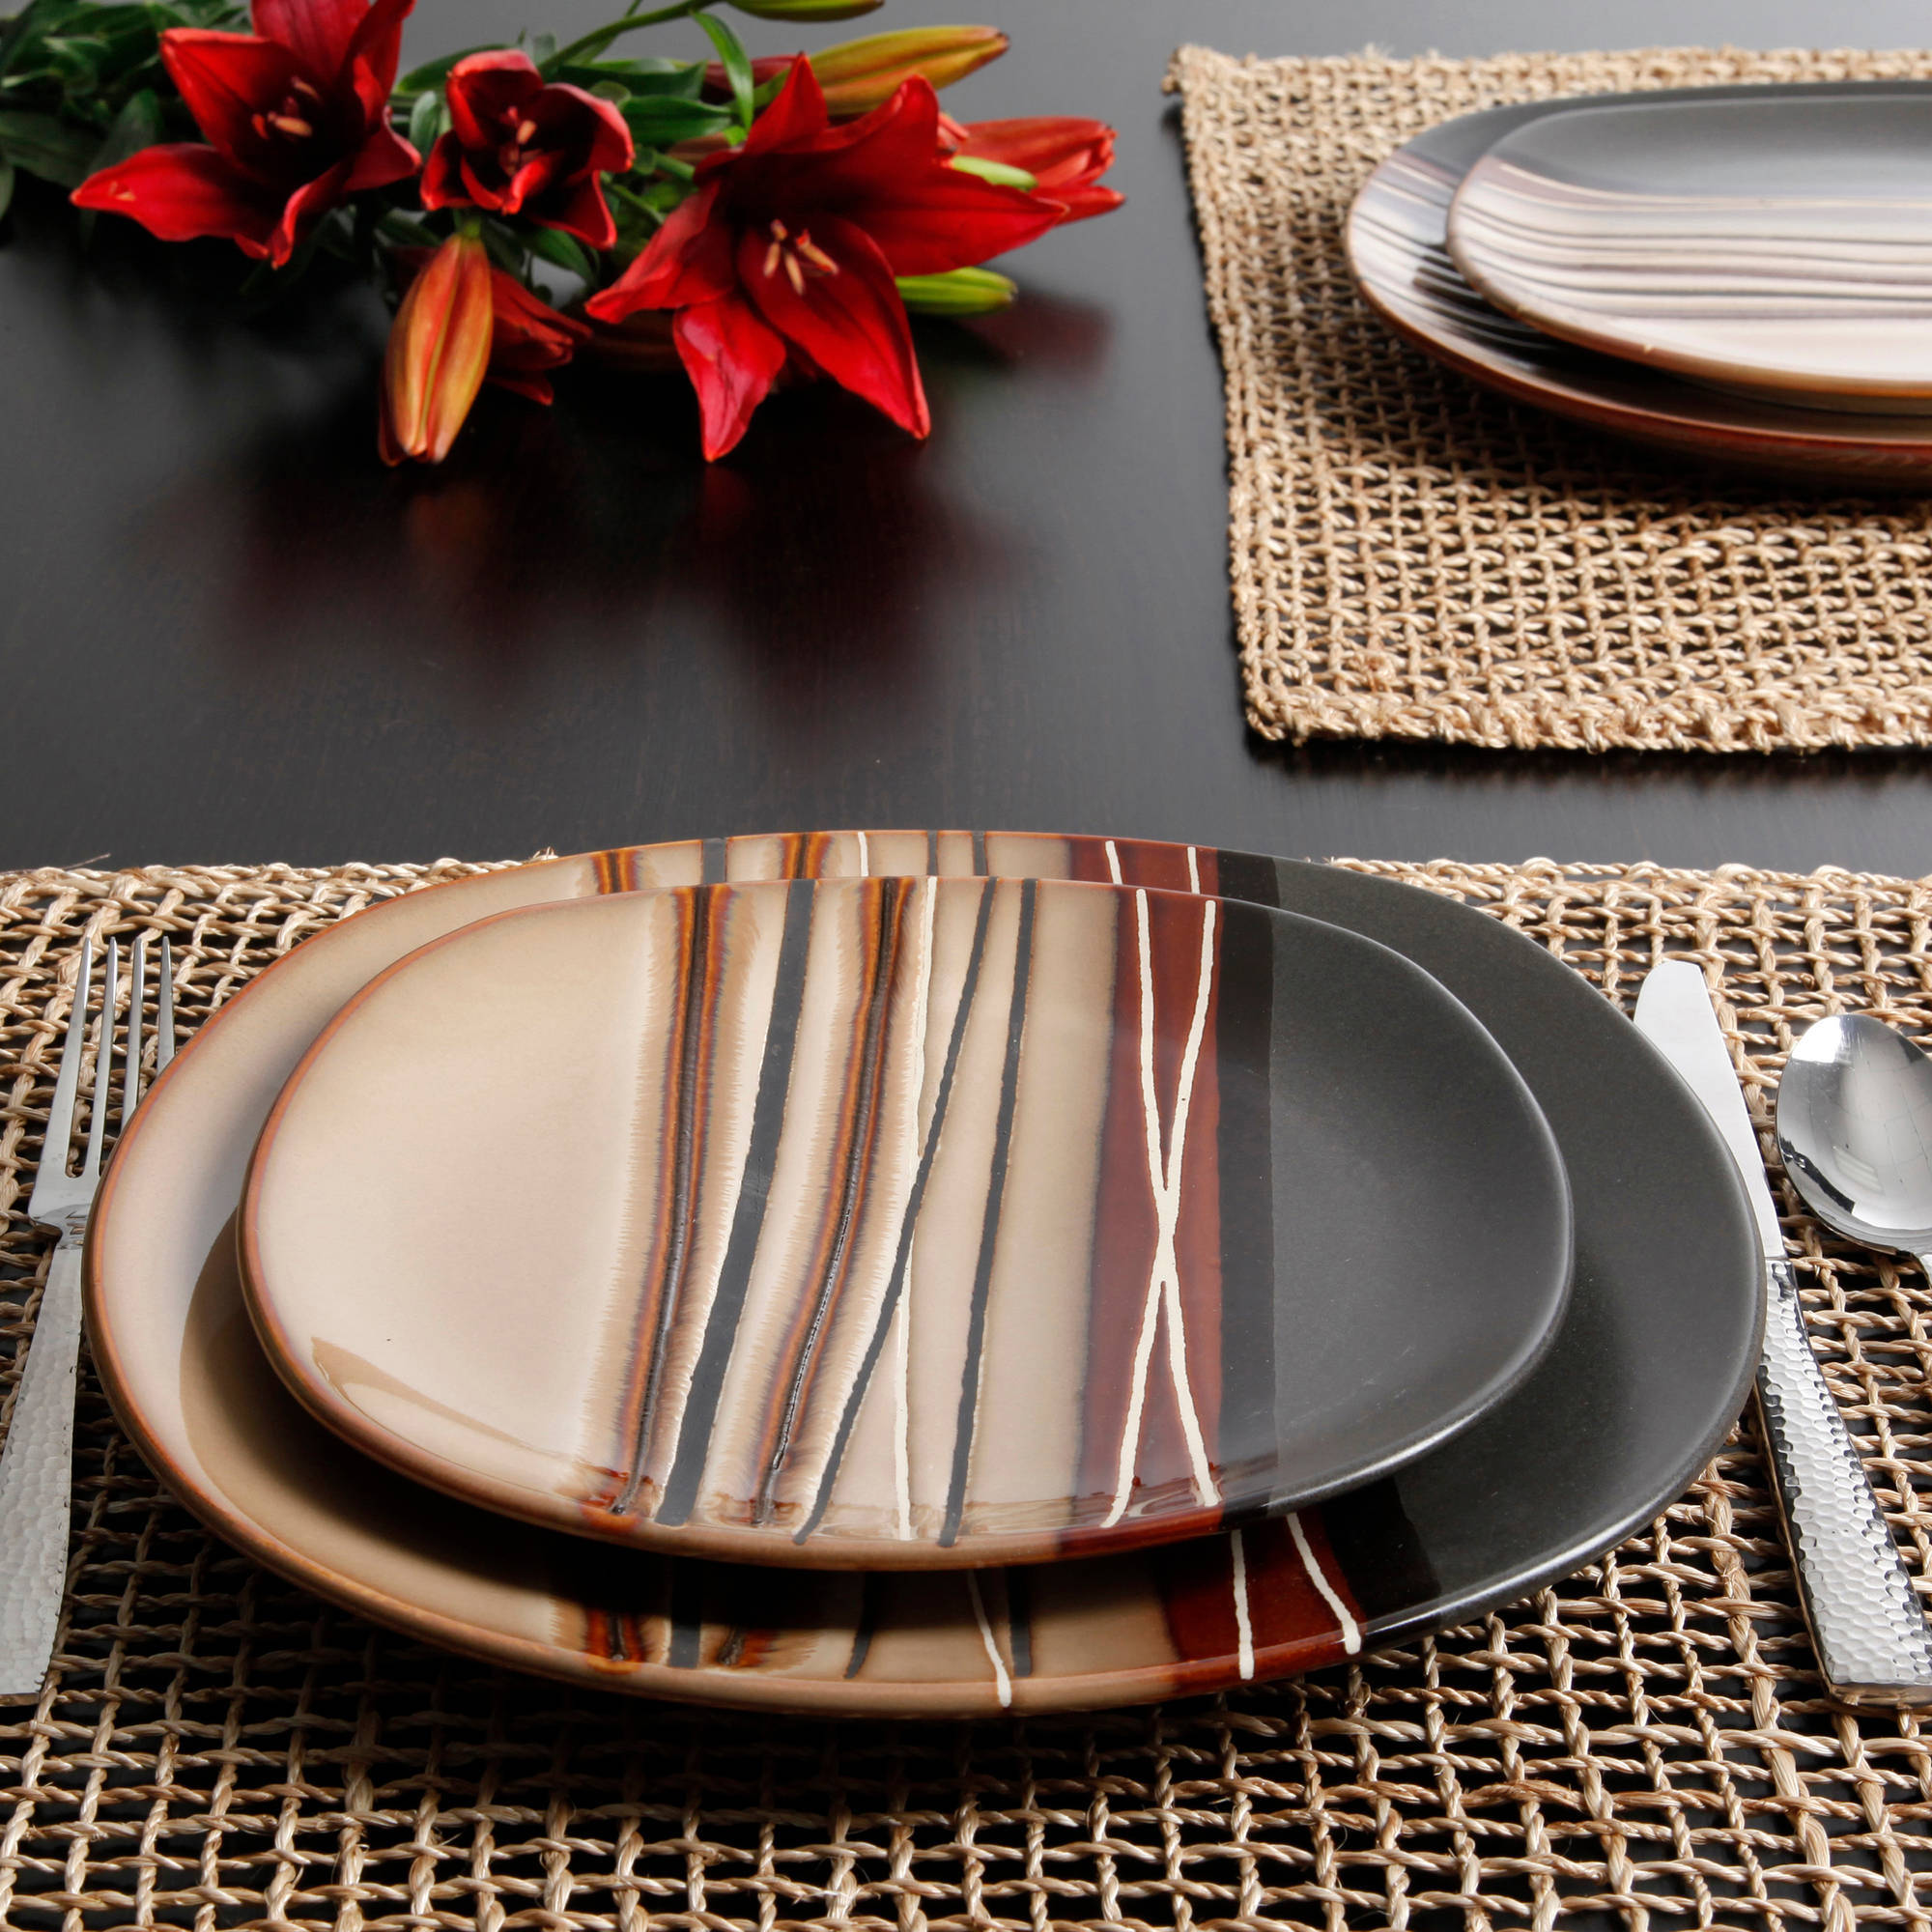 Better Homes And Gardens Bazaar Brown 16 - piece Dinnerware Set